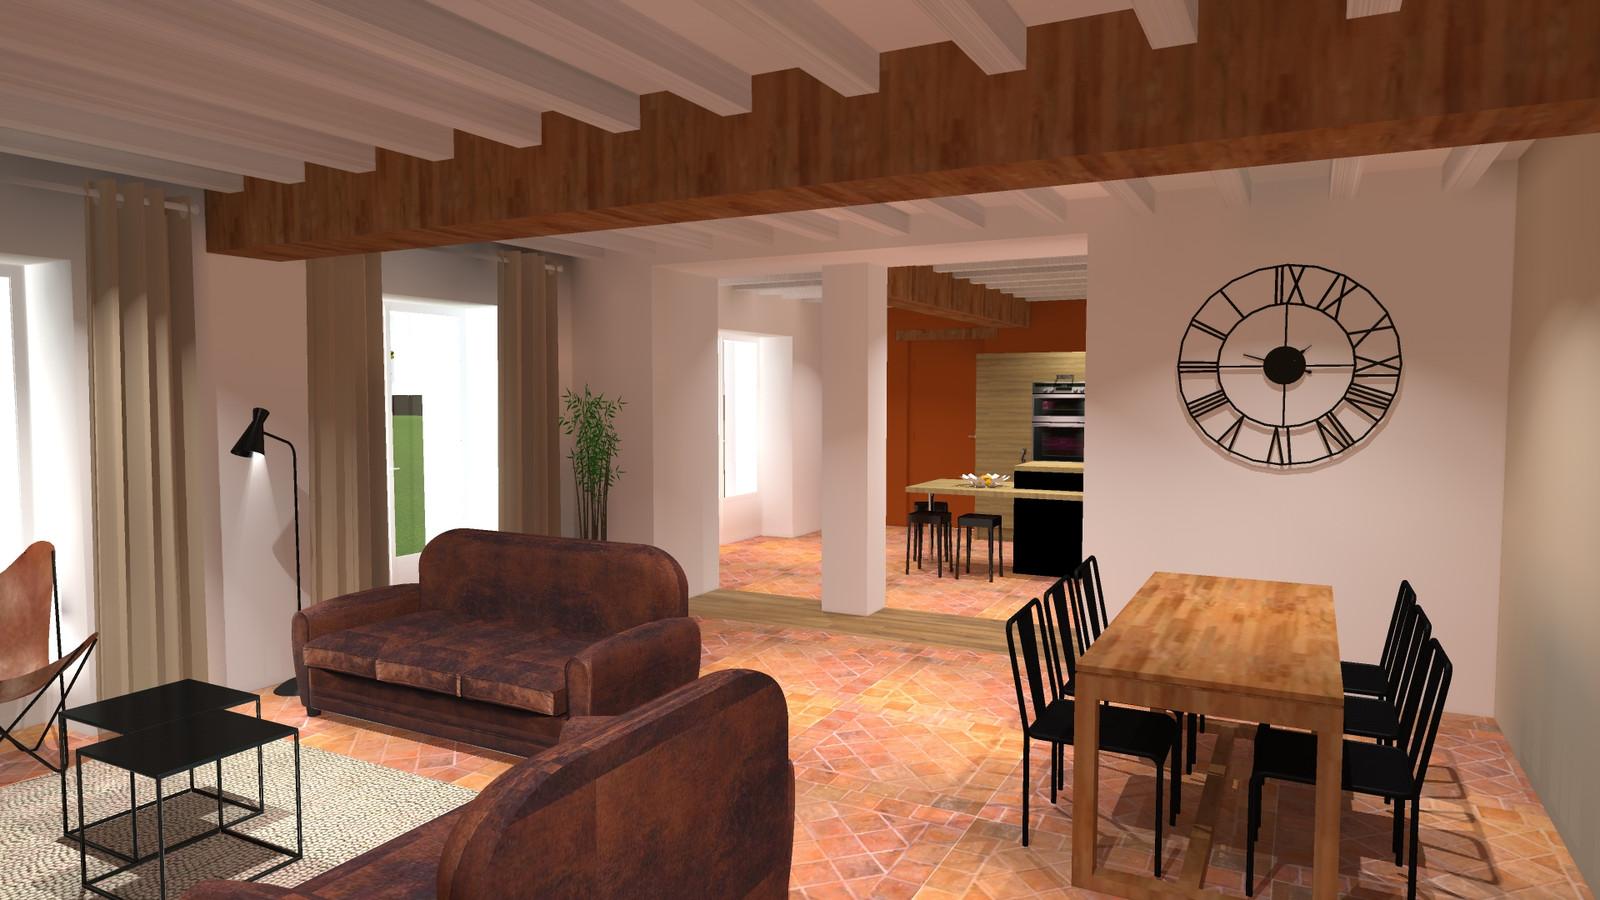 chlo billy architecte d 39 int rieur et d coratrice angers. Black Bedroom Furniture Sets. Home Design Ideas